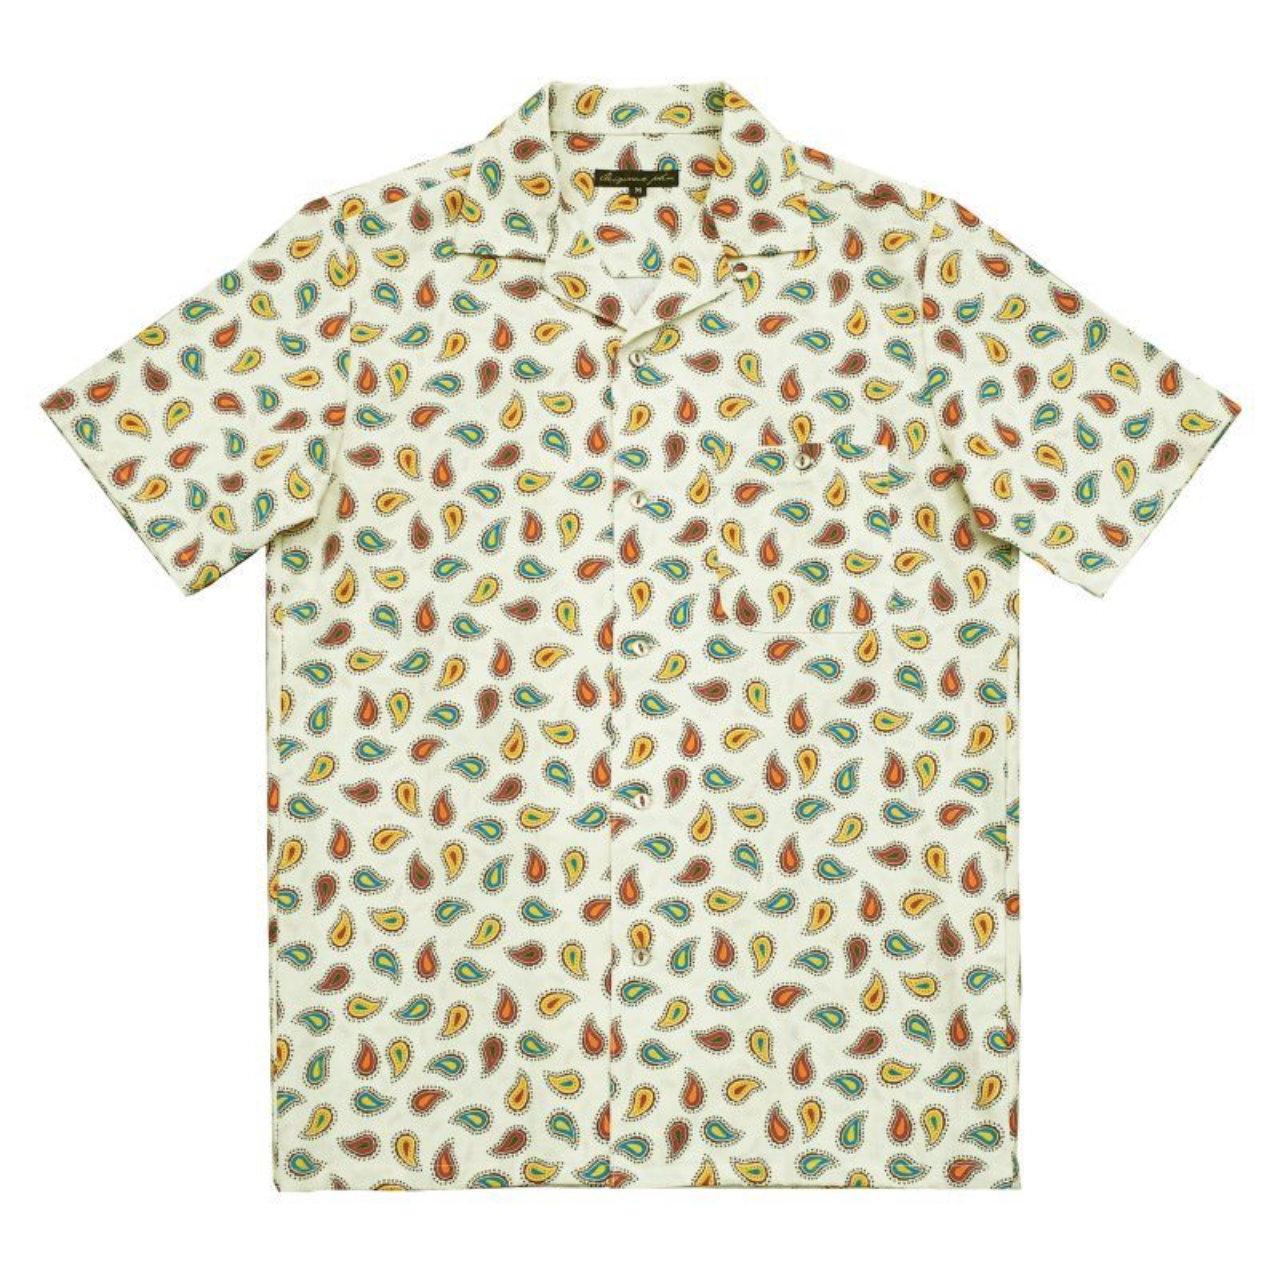 【Original John】 半袖オープンカラーシャツ ペイズリー 〈Ivory〉